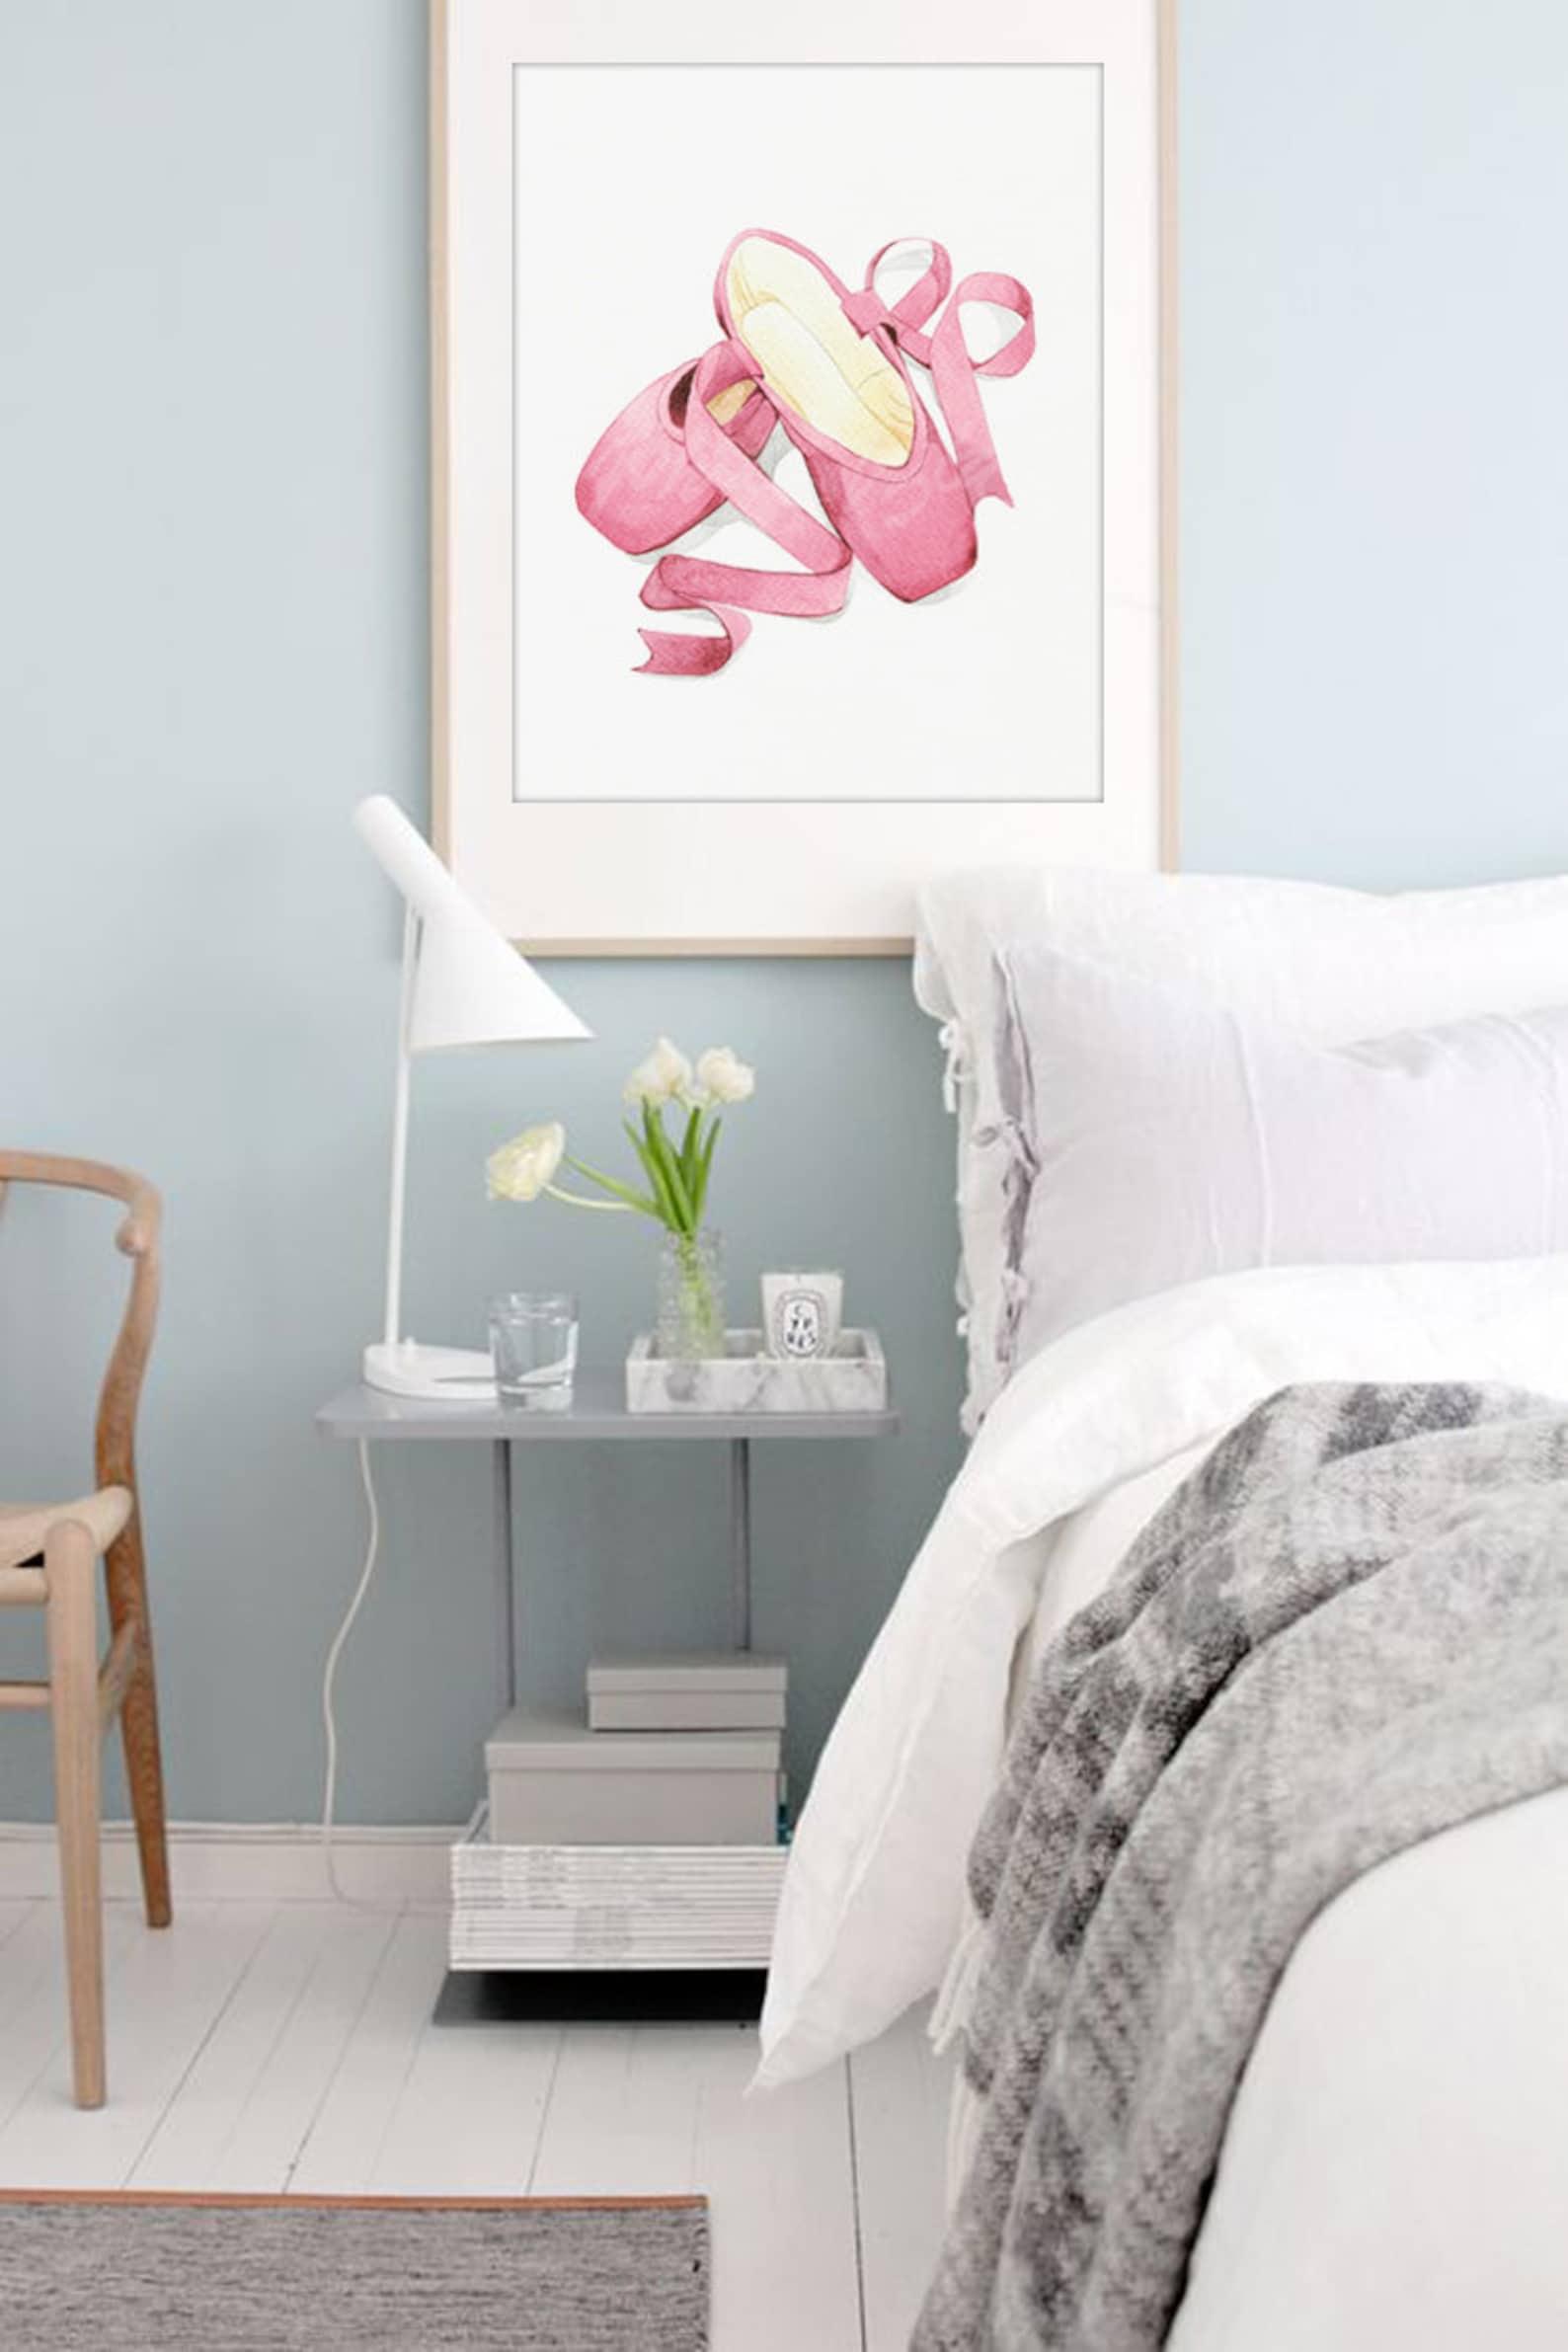 ballet decor, ballet shoes water color art prints, pink ballerina illustration, fashion decor, nursery art print digital downloa